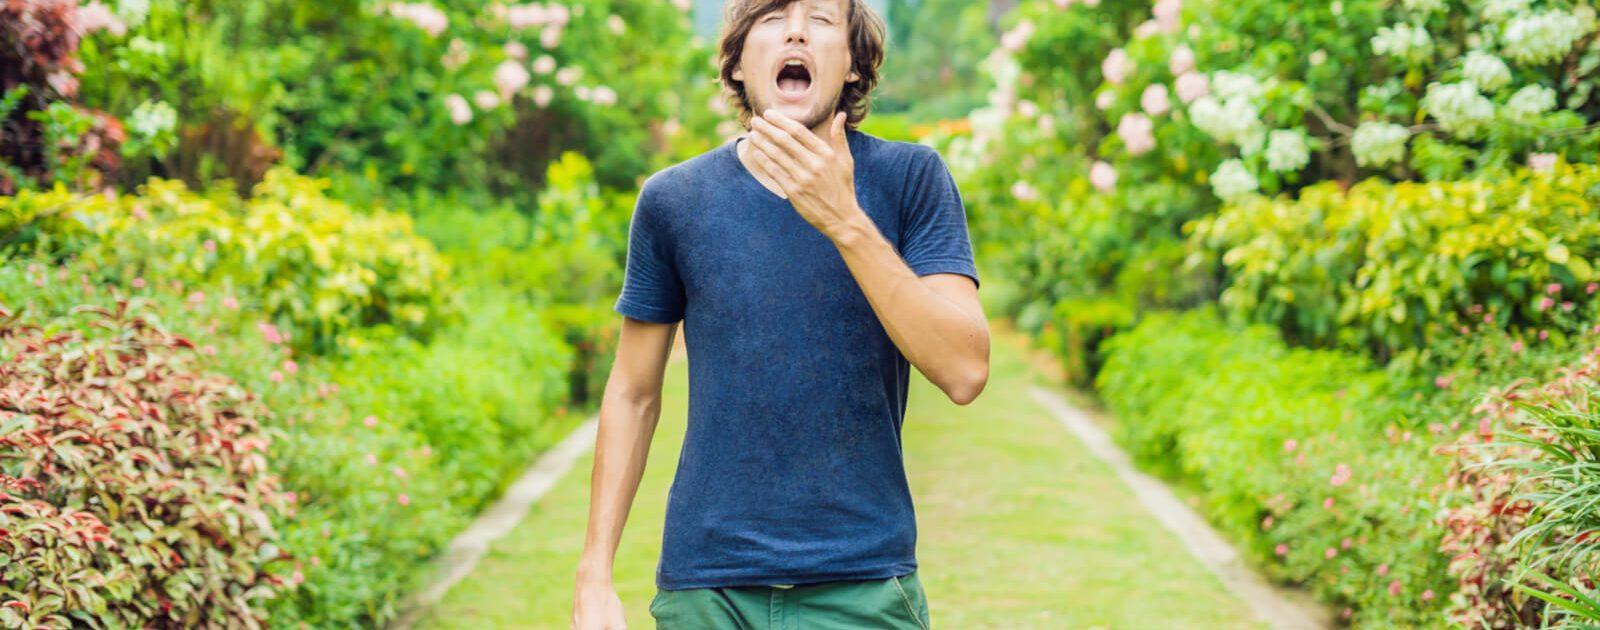 Mann muss wegen dem photischen Niesreflex niesen.